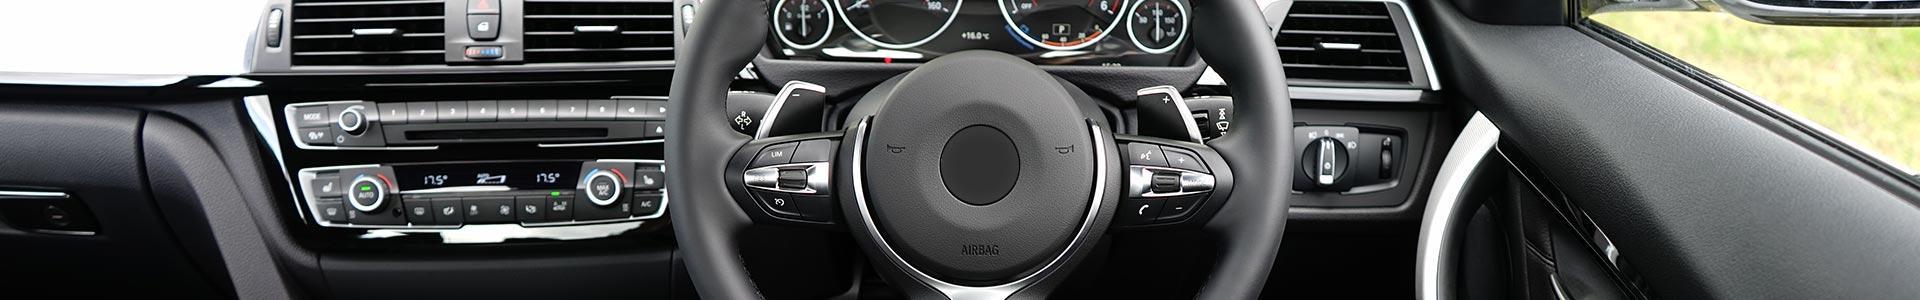 20 most annoying car features | AutoGuru